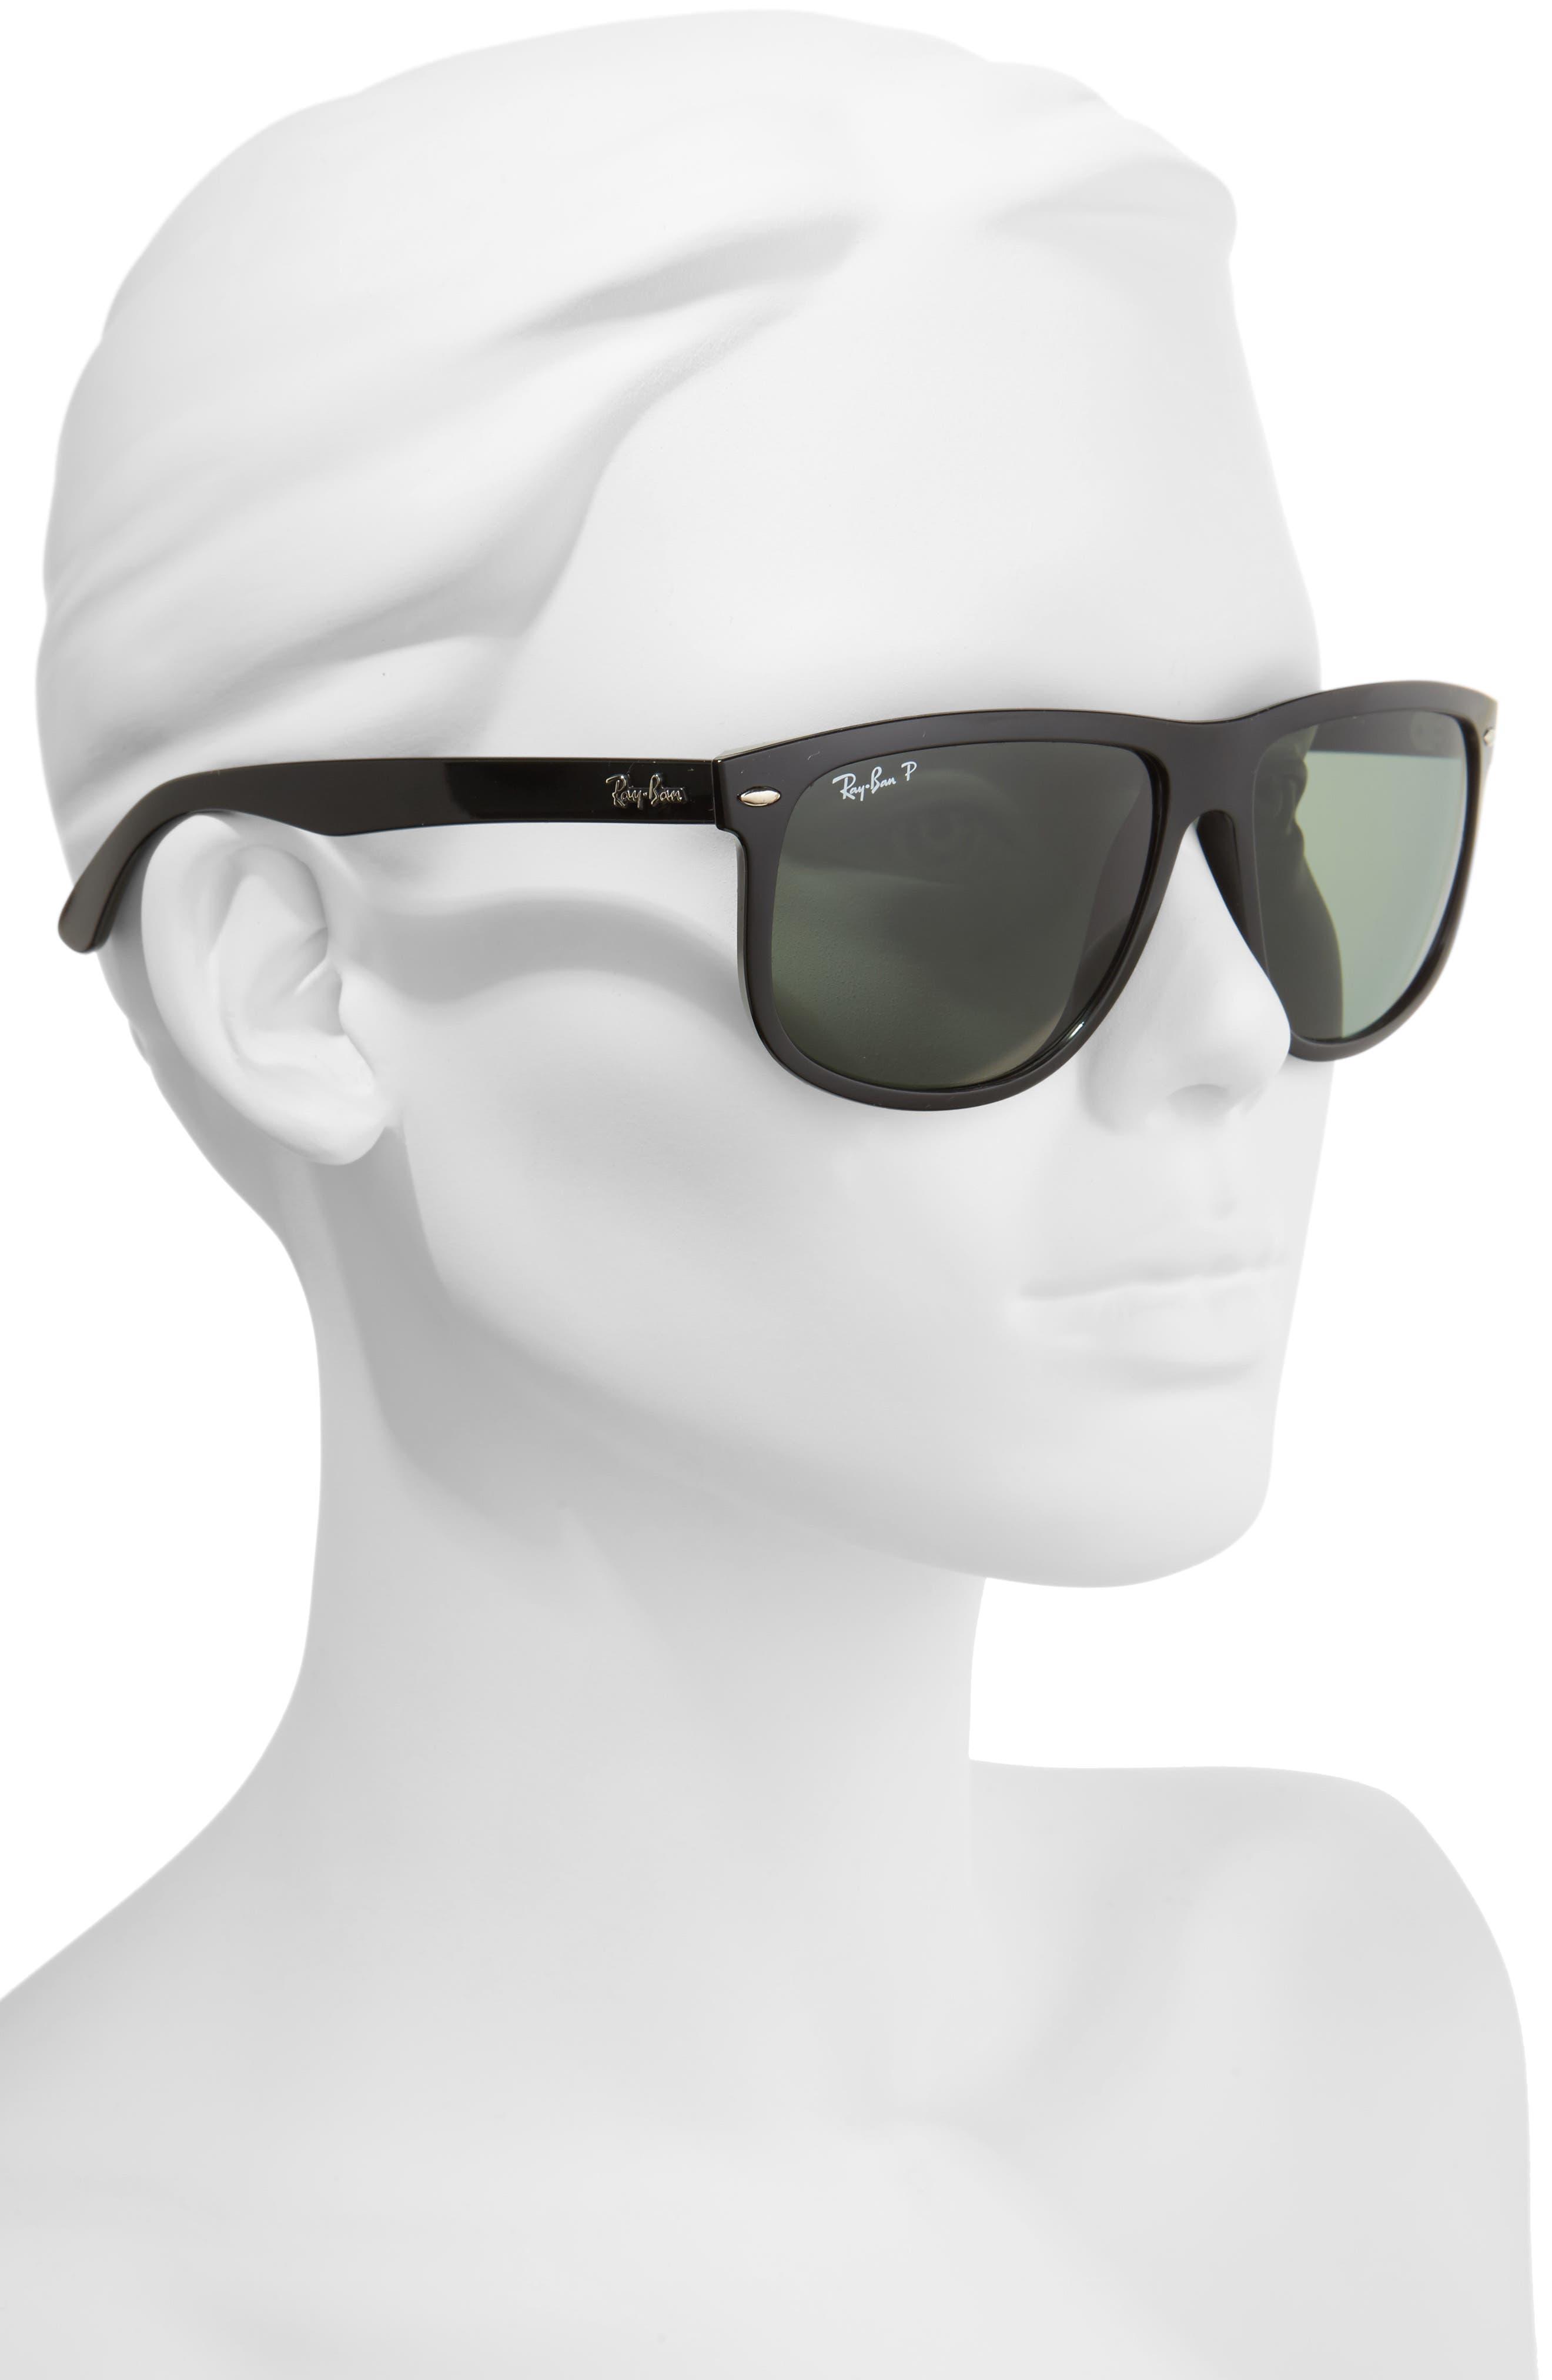 Highstreet 60mm Polarized Flat Top Sunglasses,                             Alternate thumbnail 3, color,                             BLACK POLARIZED